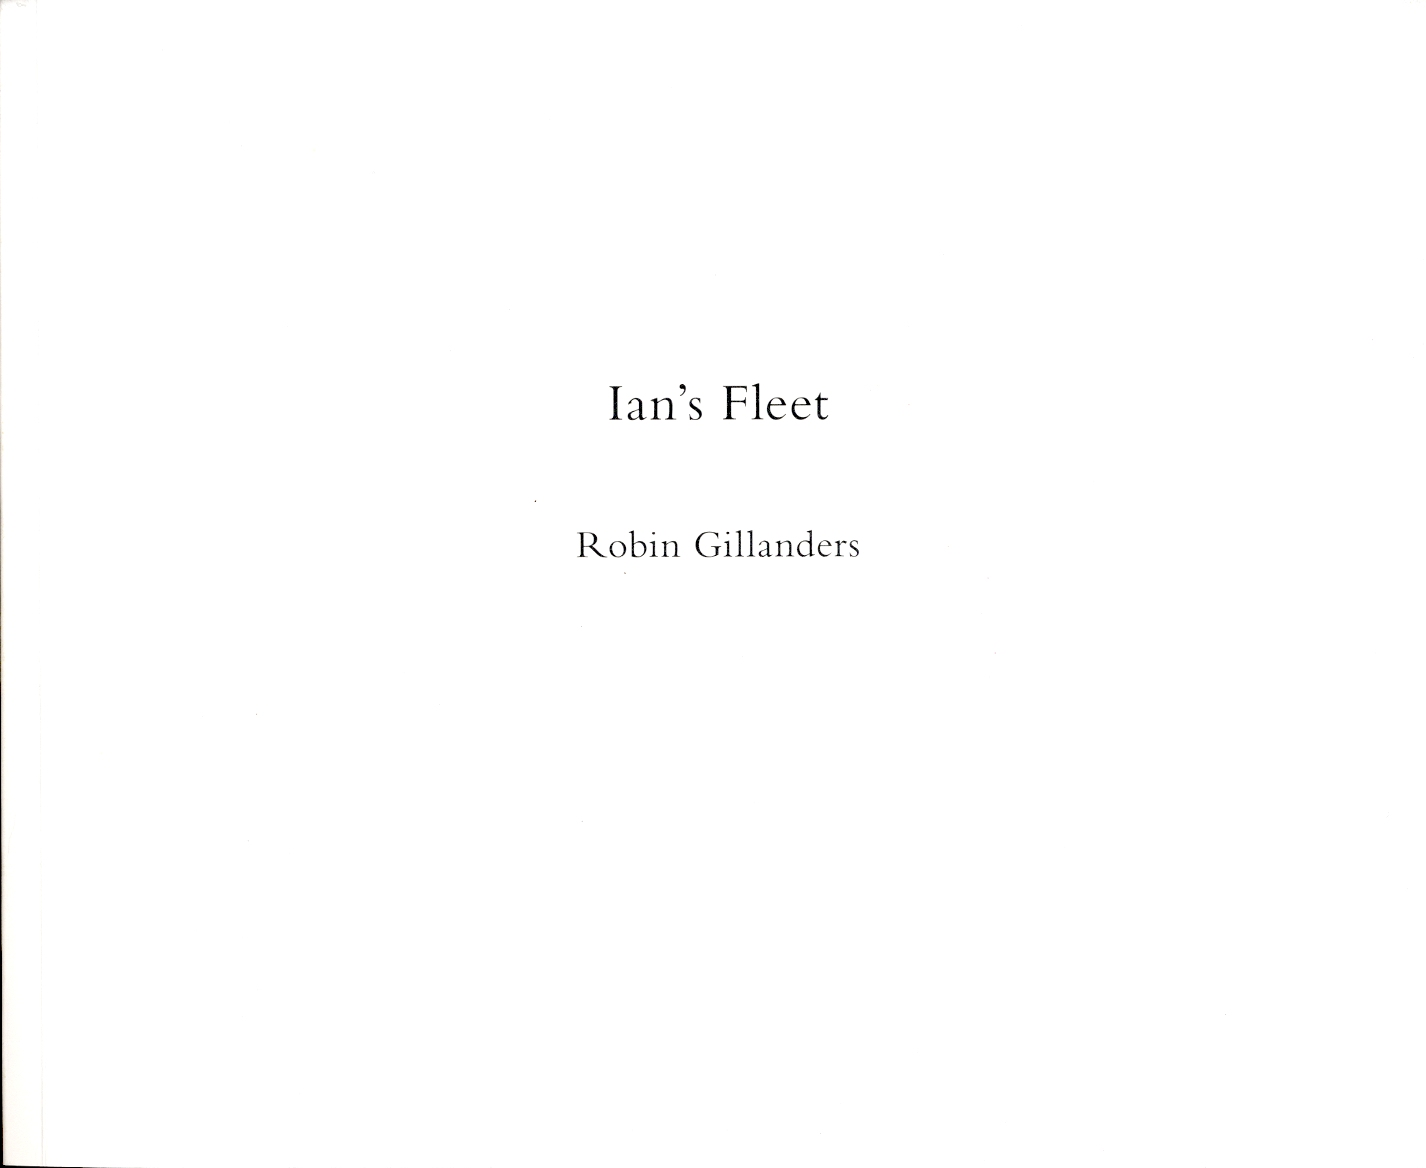 Robin Gillanders